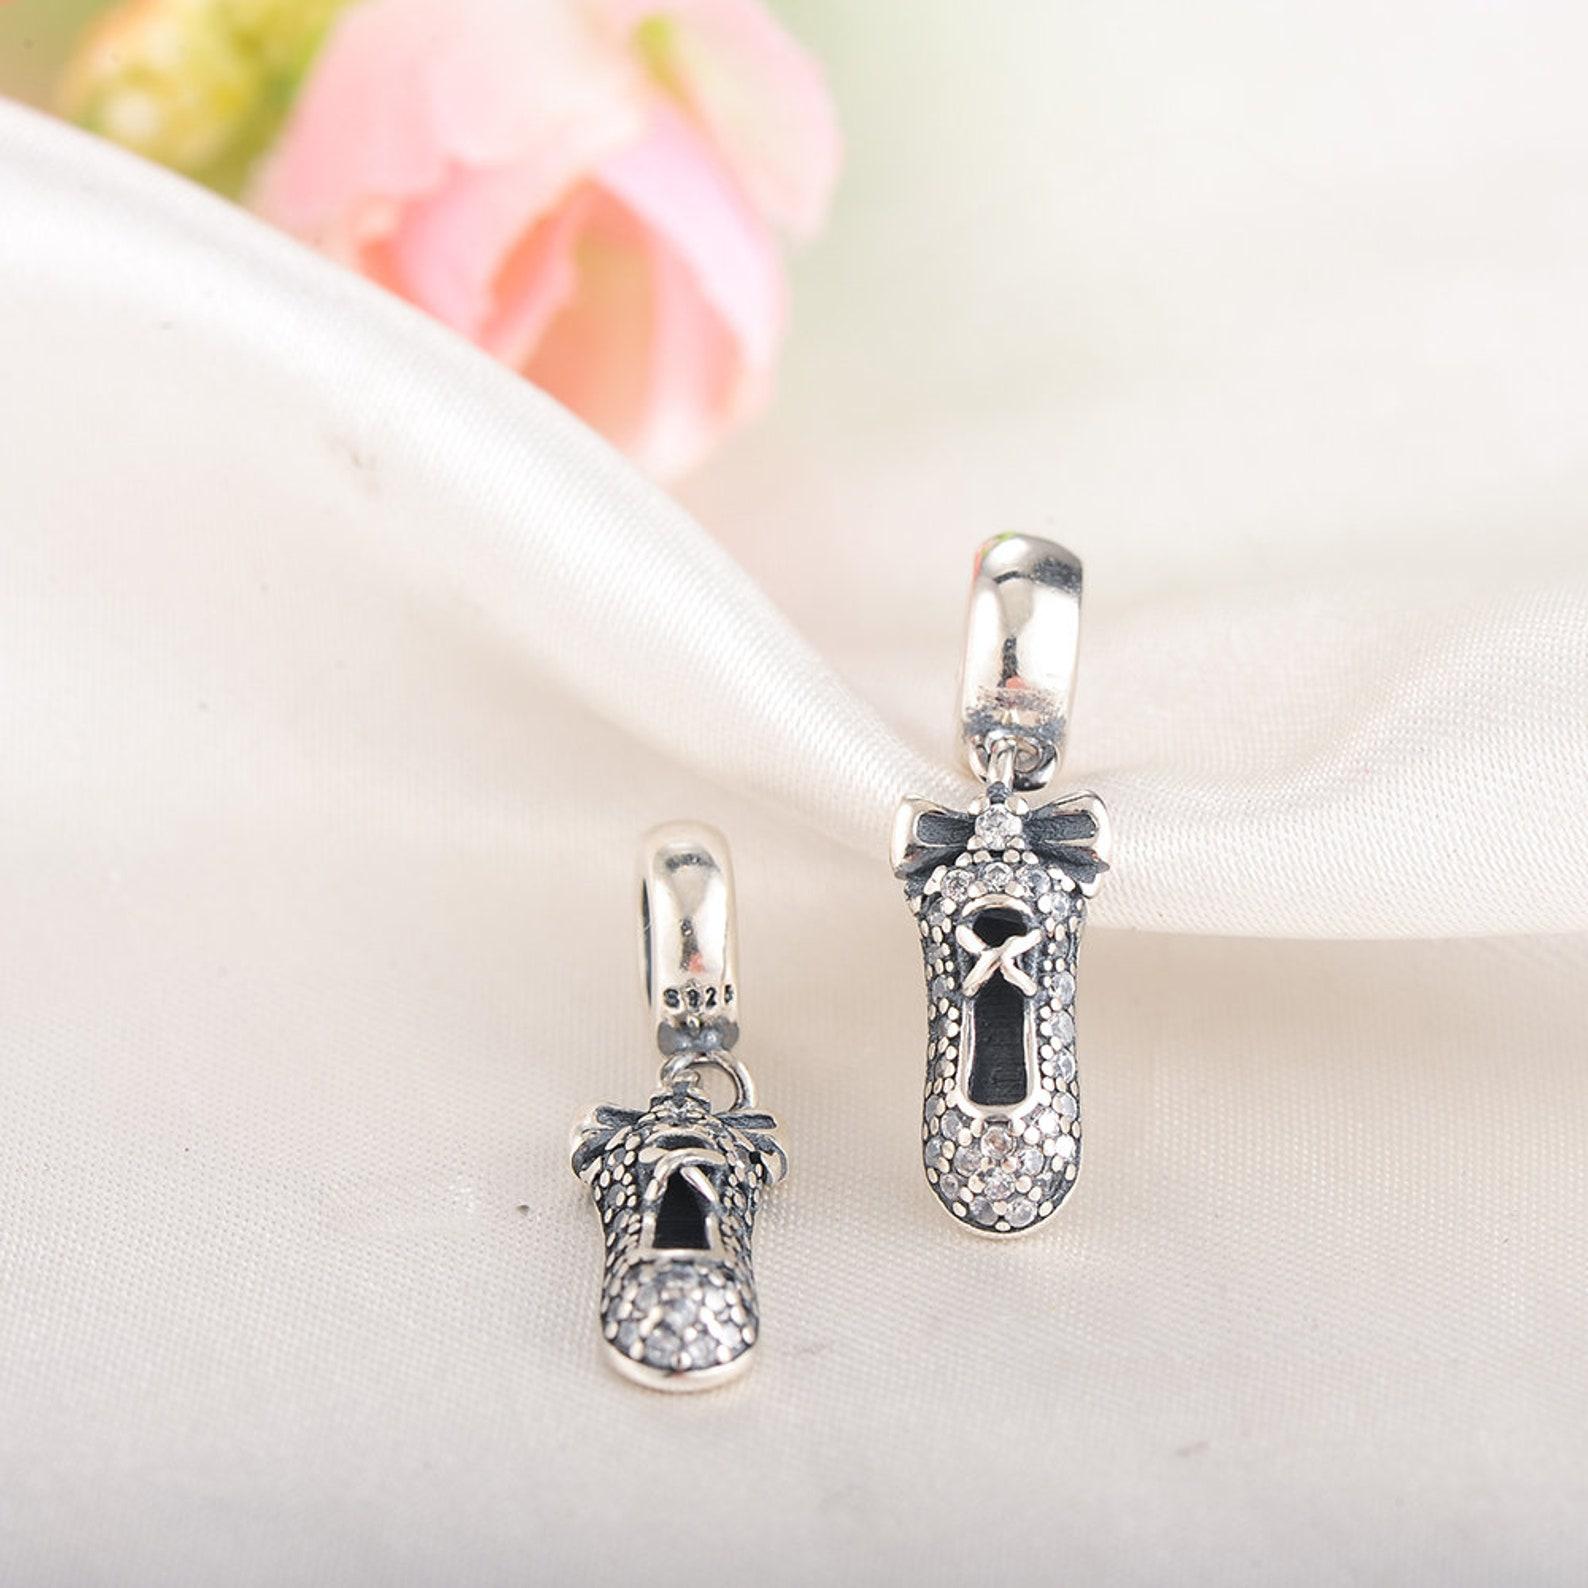 sterling silver ballet shoe charm, ballet charm, ballerina charm, shoe charm, ballet pendant, ballet necklace, fits pandora brac